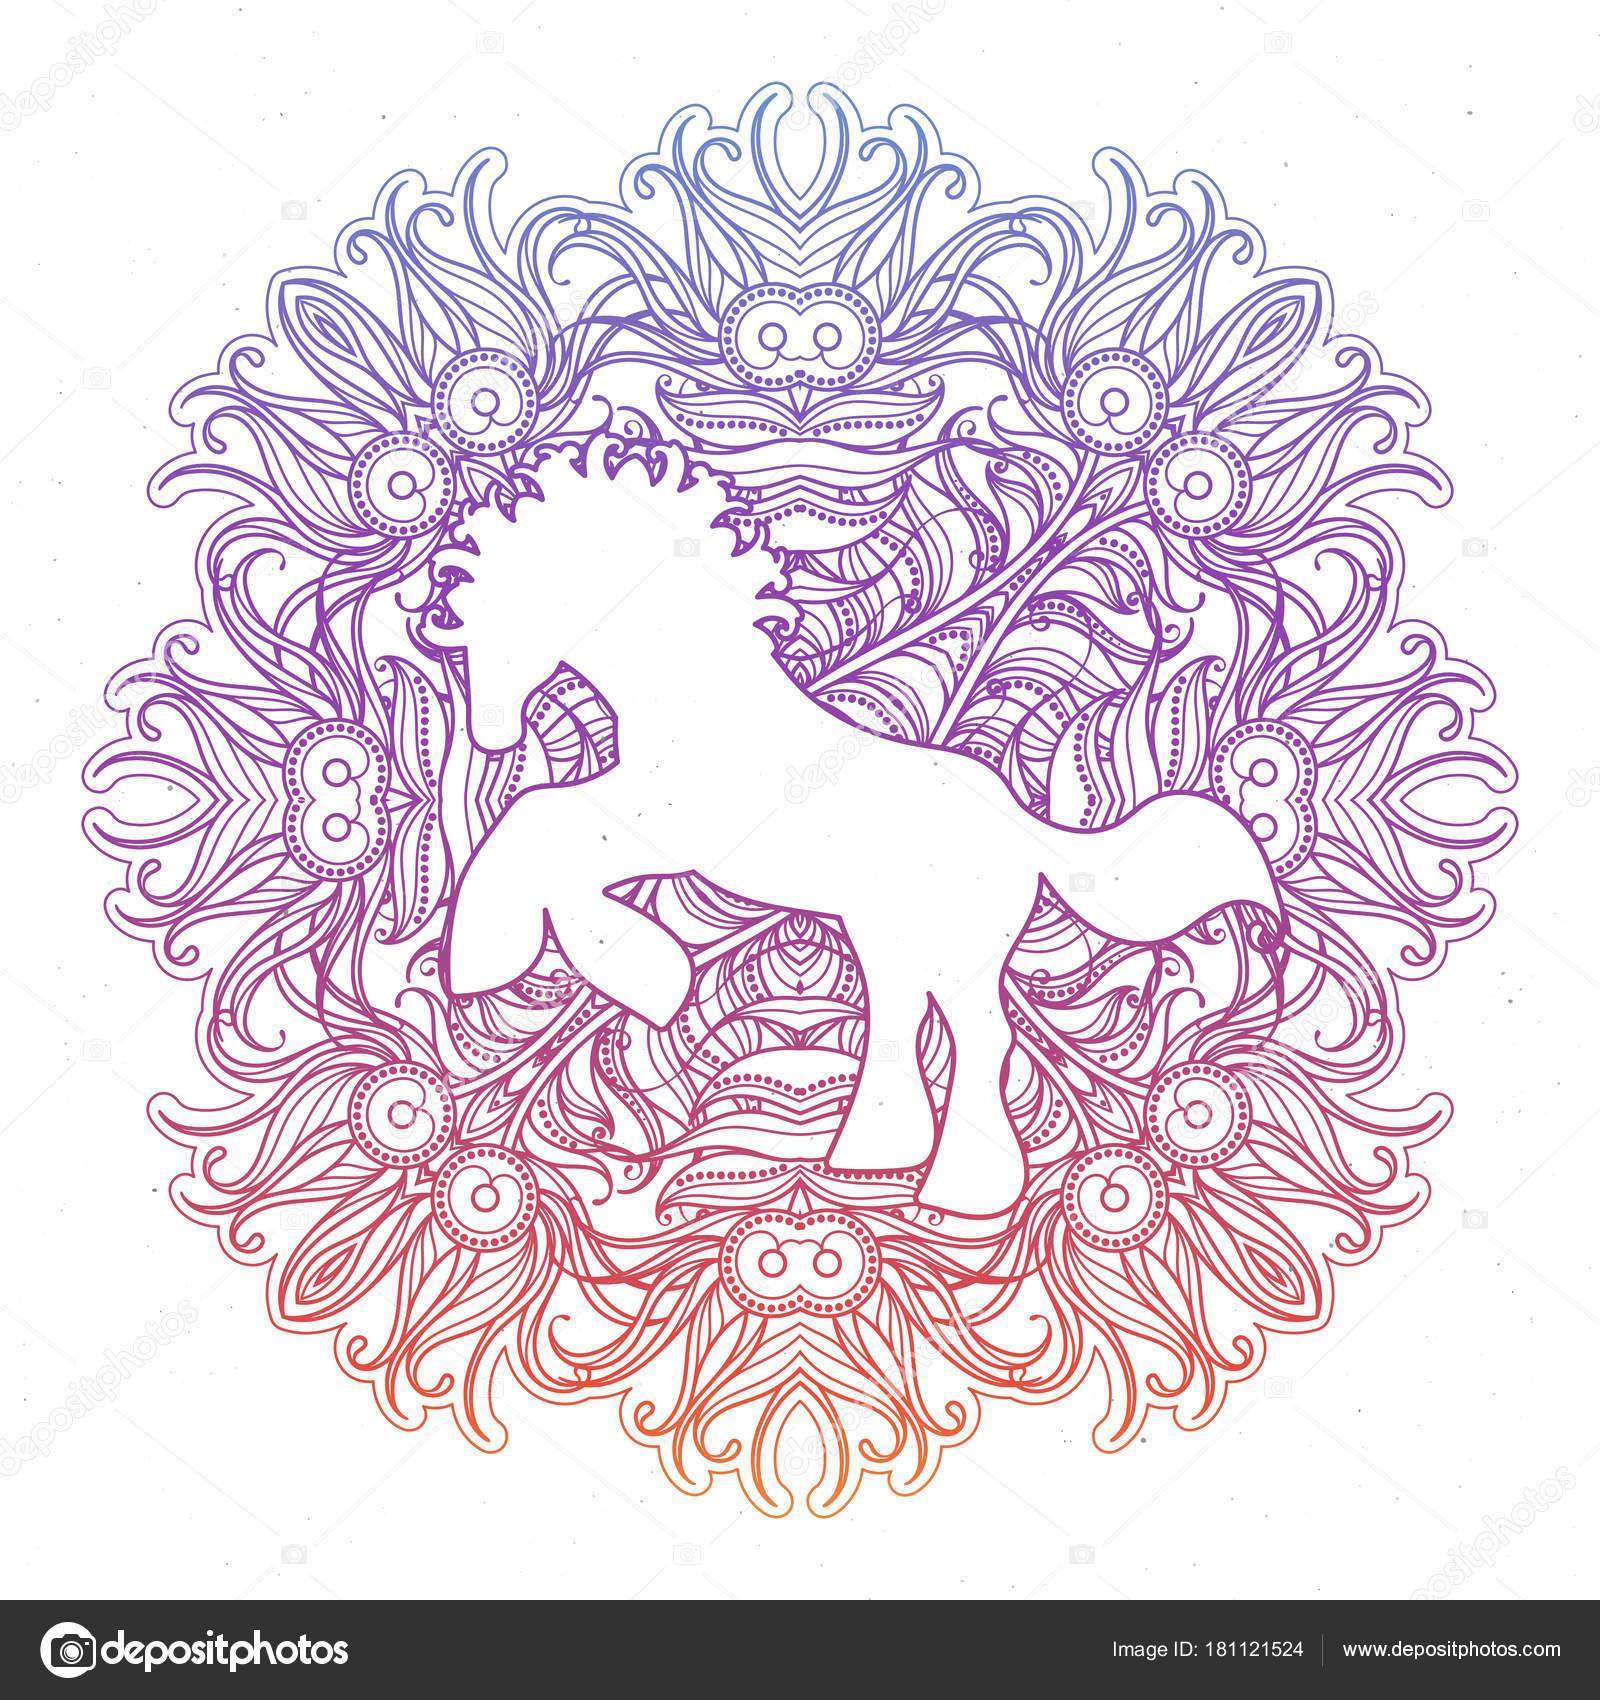 anti stressprogramma lineaire pagina met paard zentangle